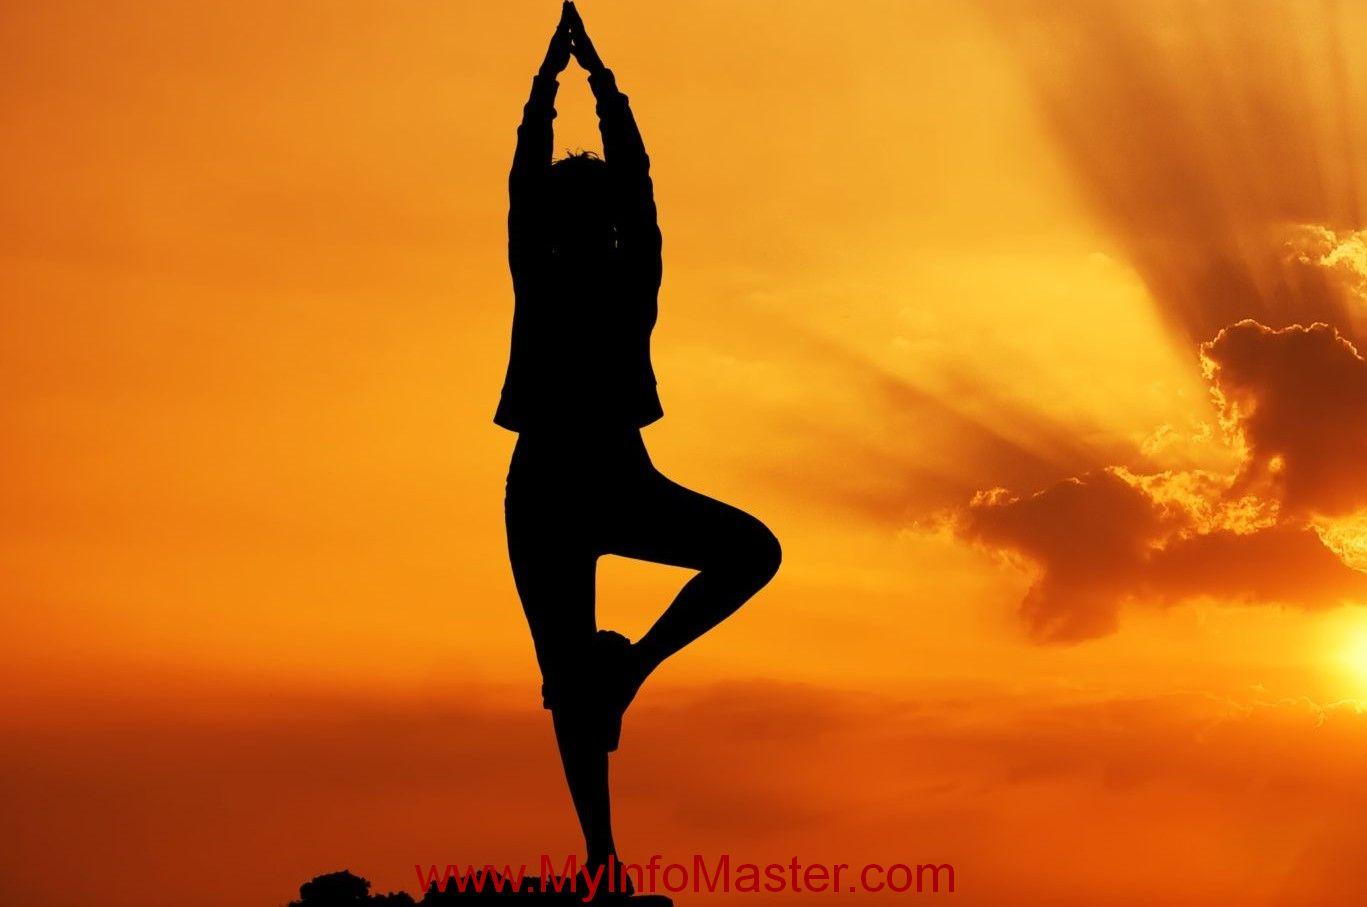 Yoga, gentle yoga flow, yoga facts, top hatha, stress yoga, yoga type, yoga memes, yoga results, yoga wuotes, how to yoga, yoga postures, best types of yoga